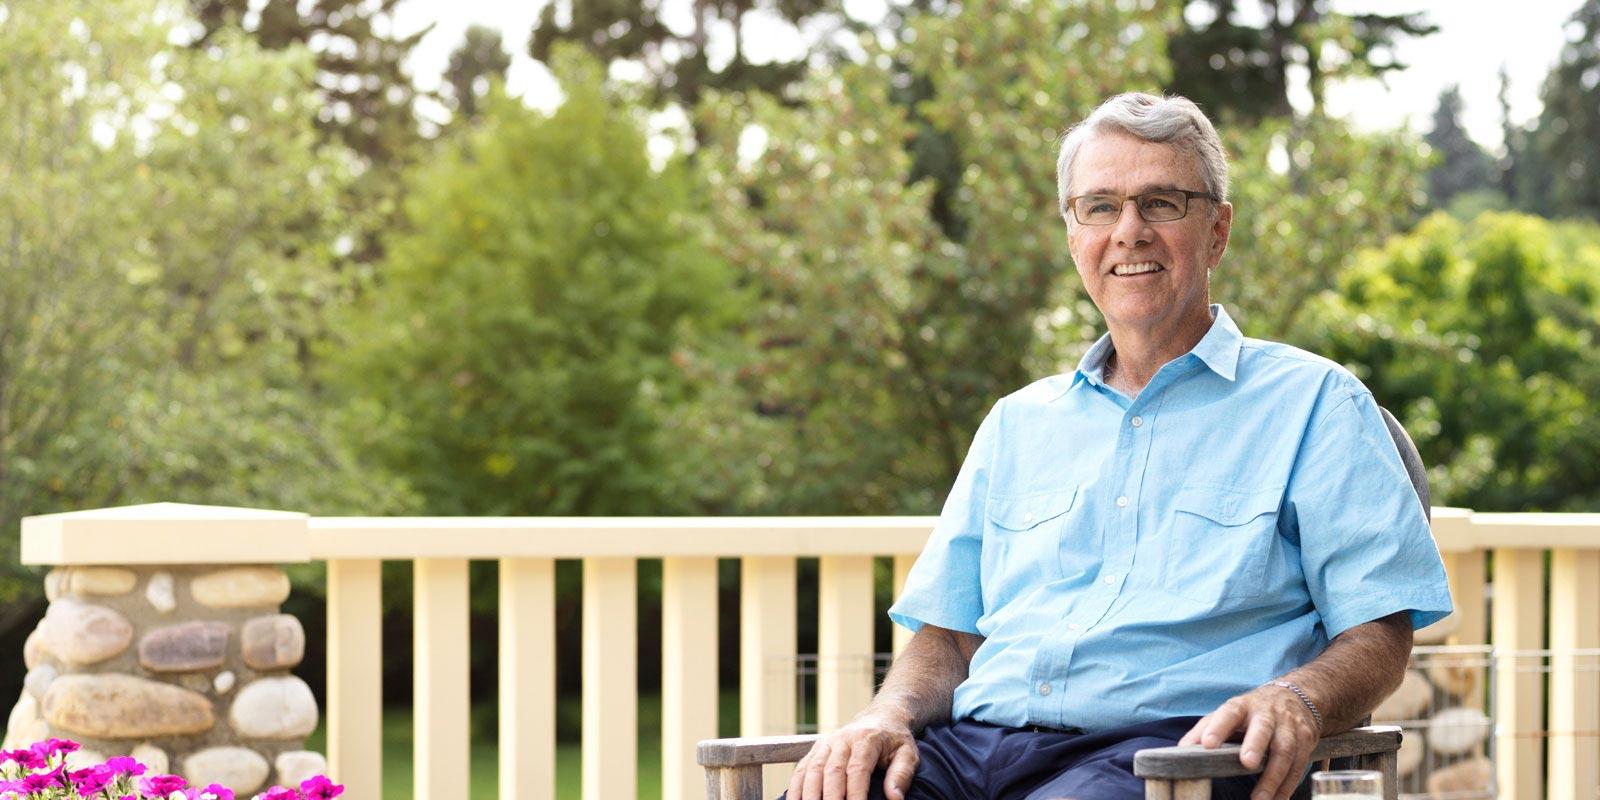 Alberta Cancer Foundation - Glioblastoma